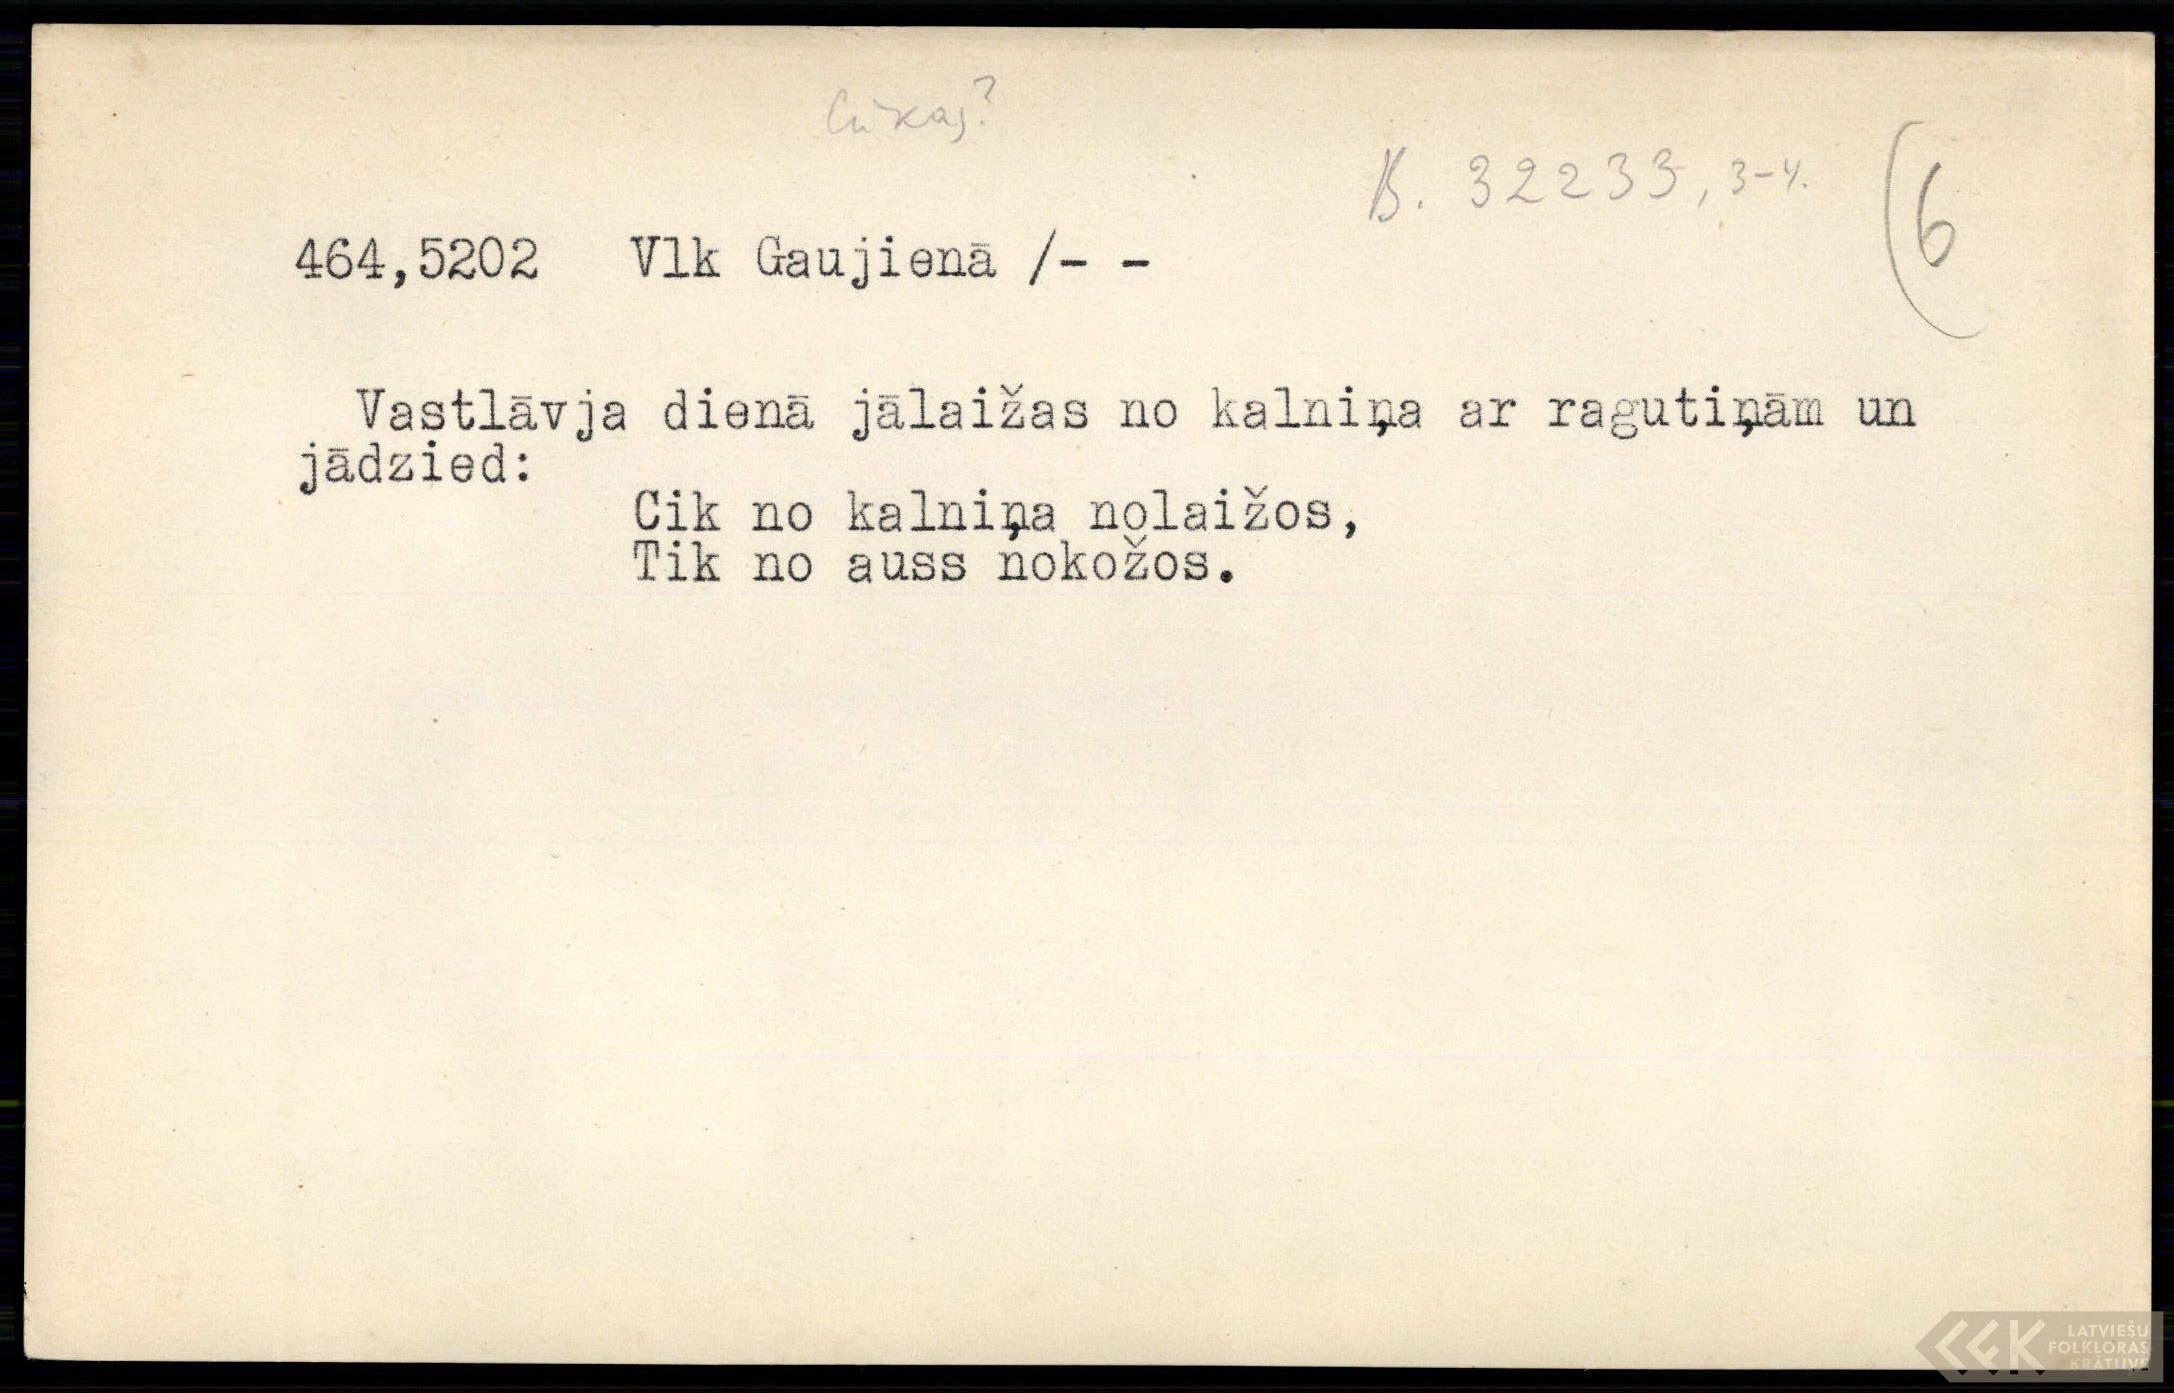 LFK-0464-05202-buramvardu-kartoteka